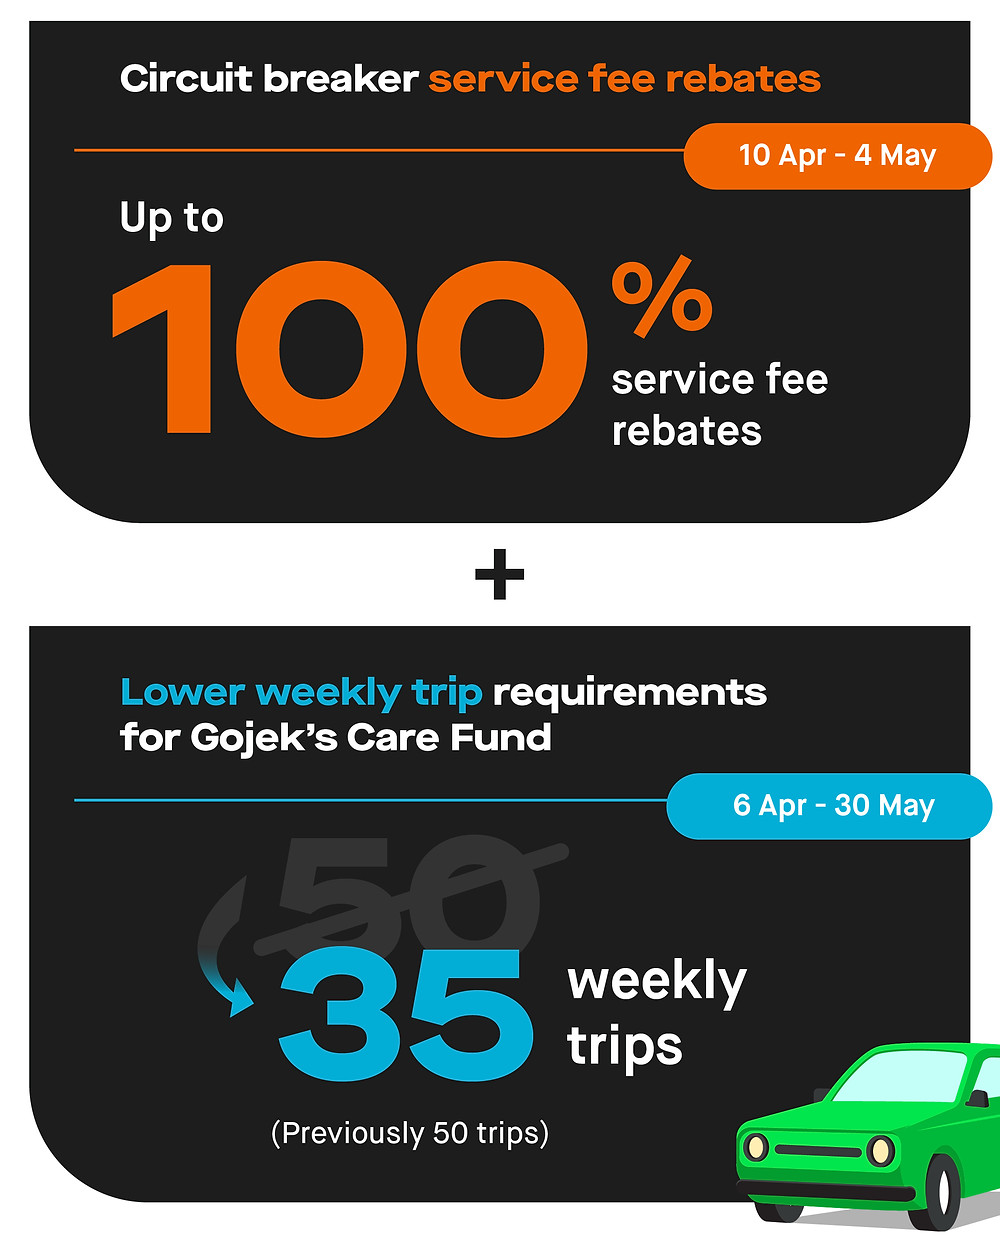 Gojek circuit breaker service fee rebates